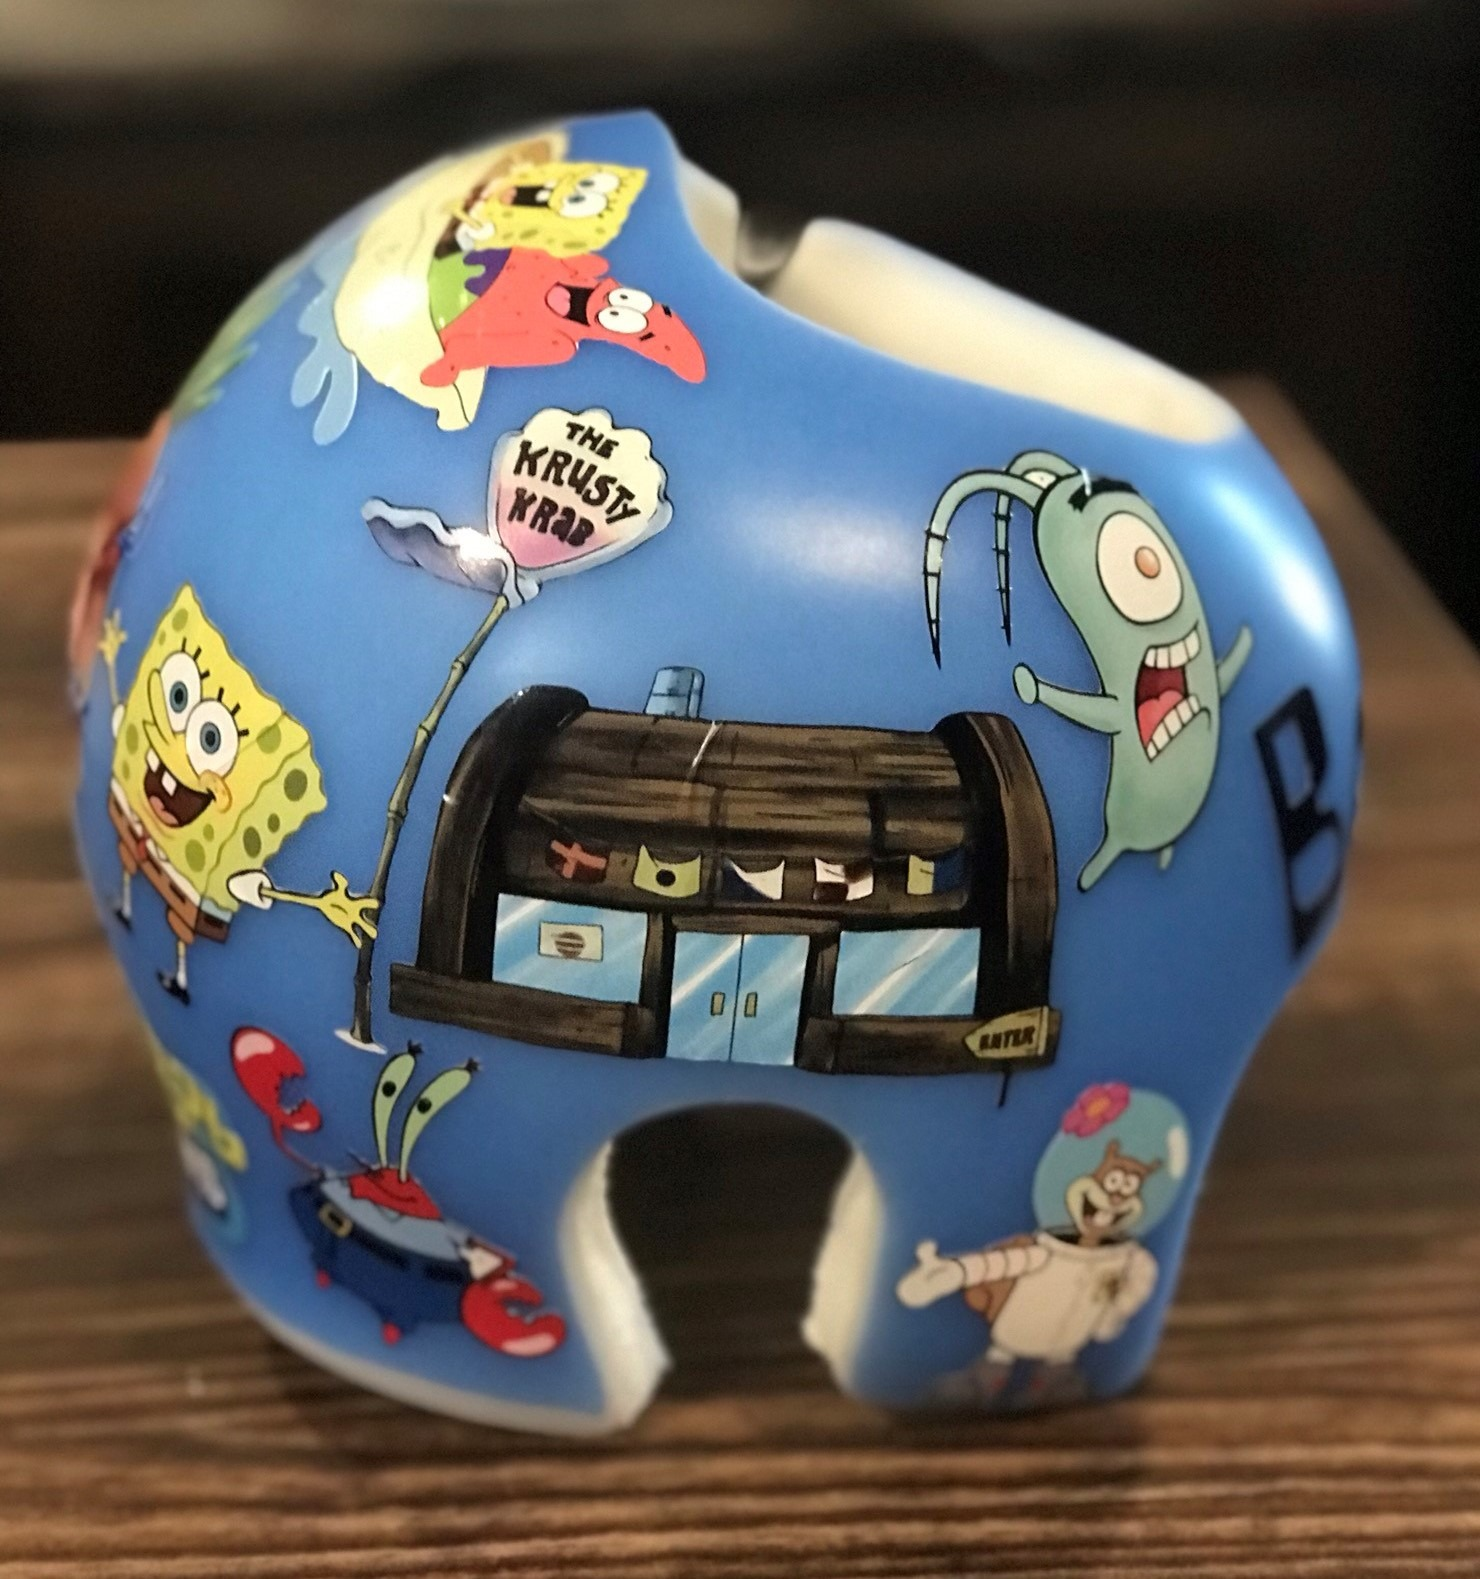 sponge bob square pants cranial band